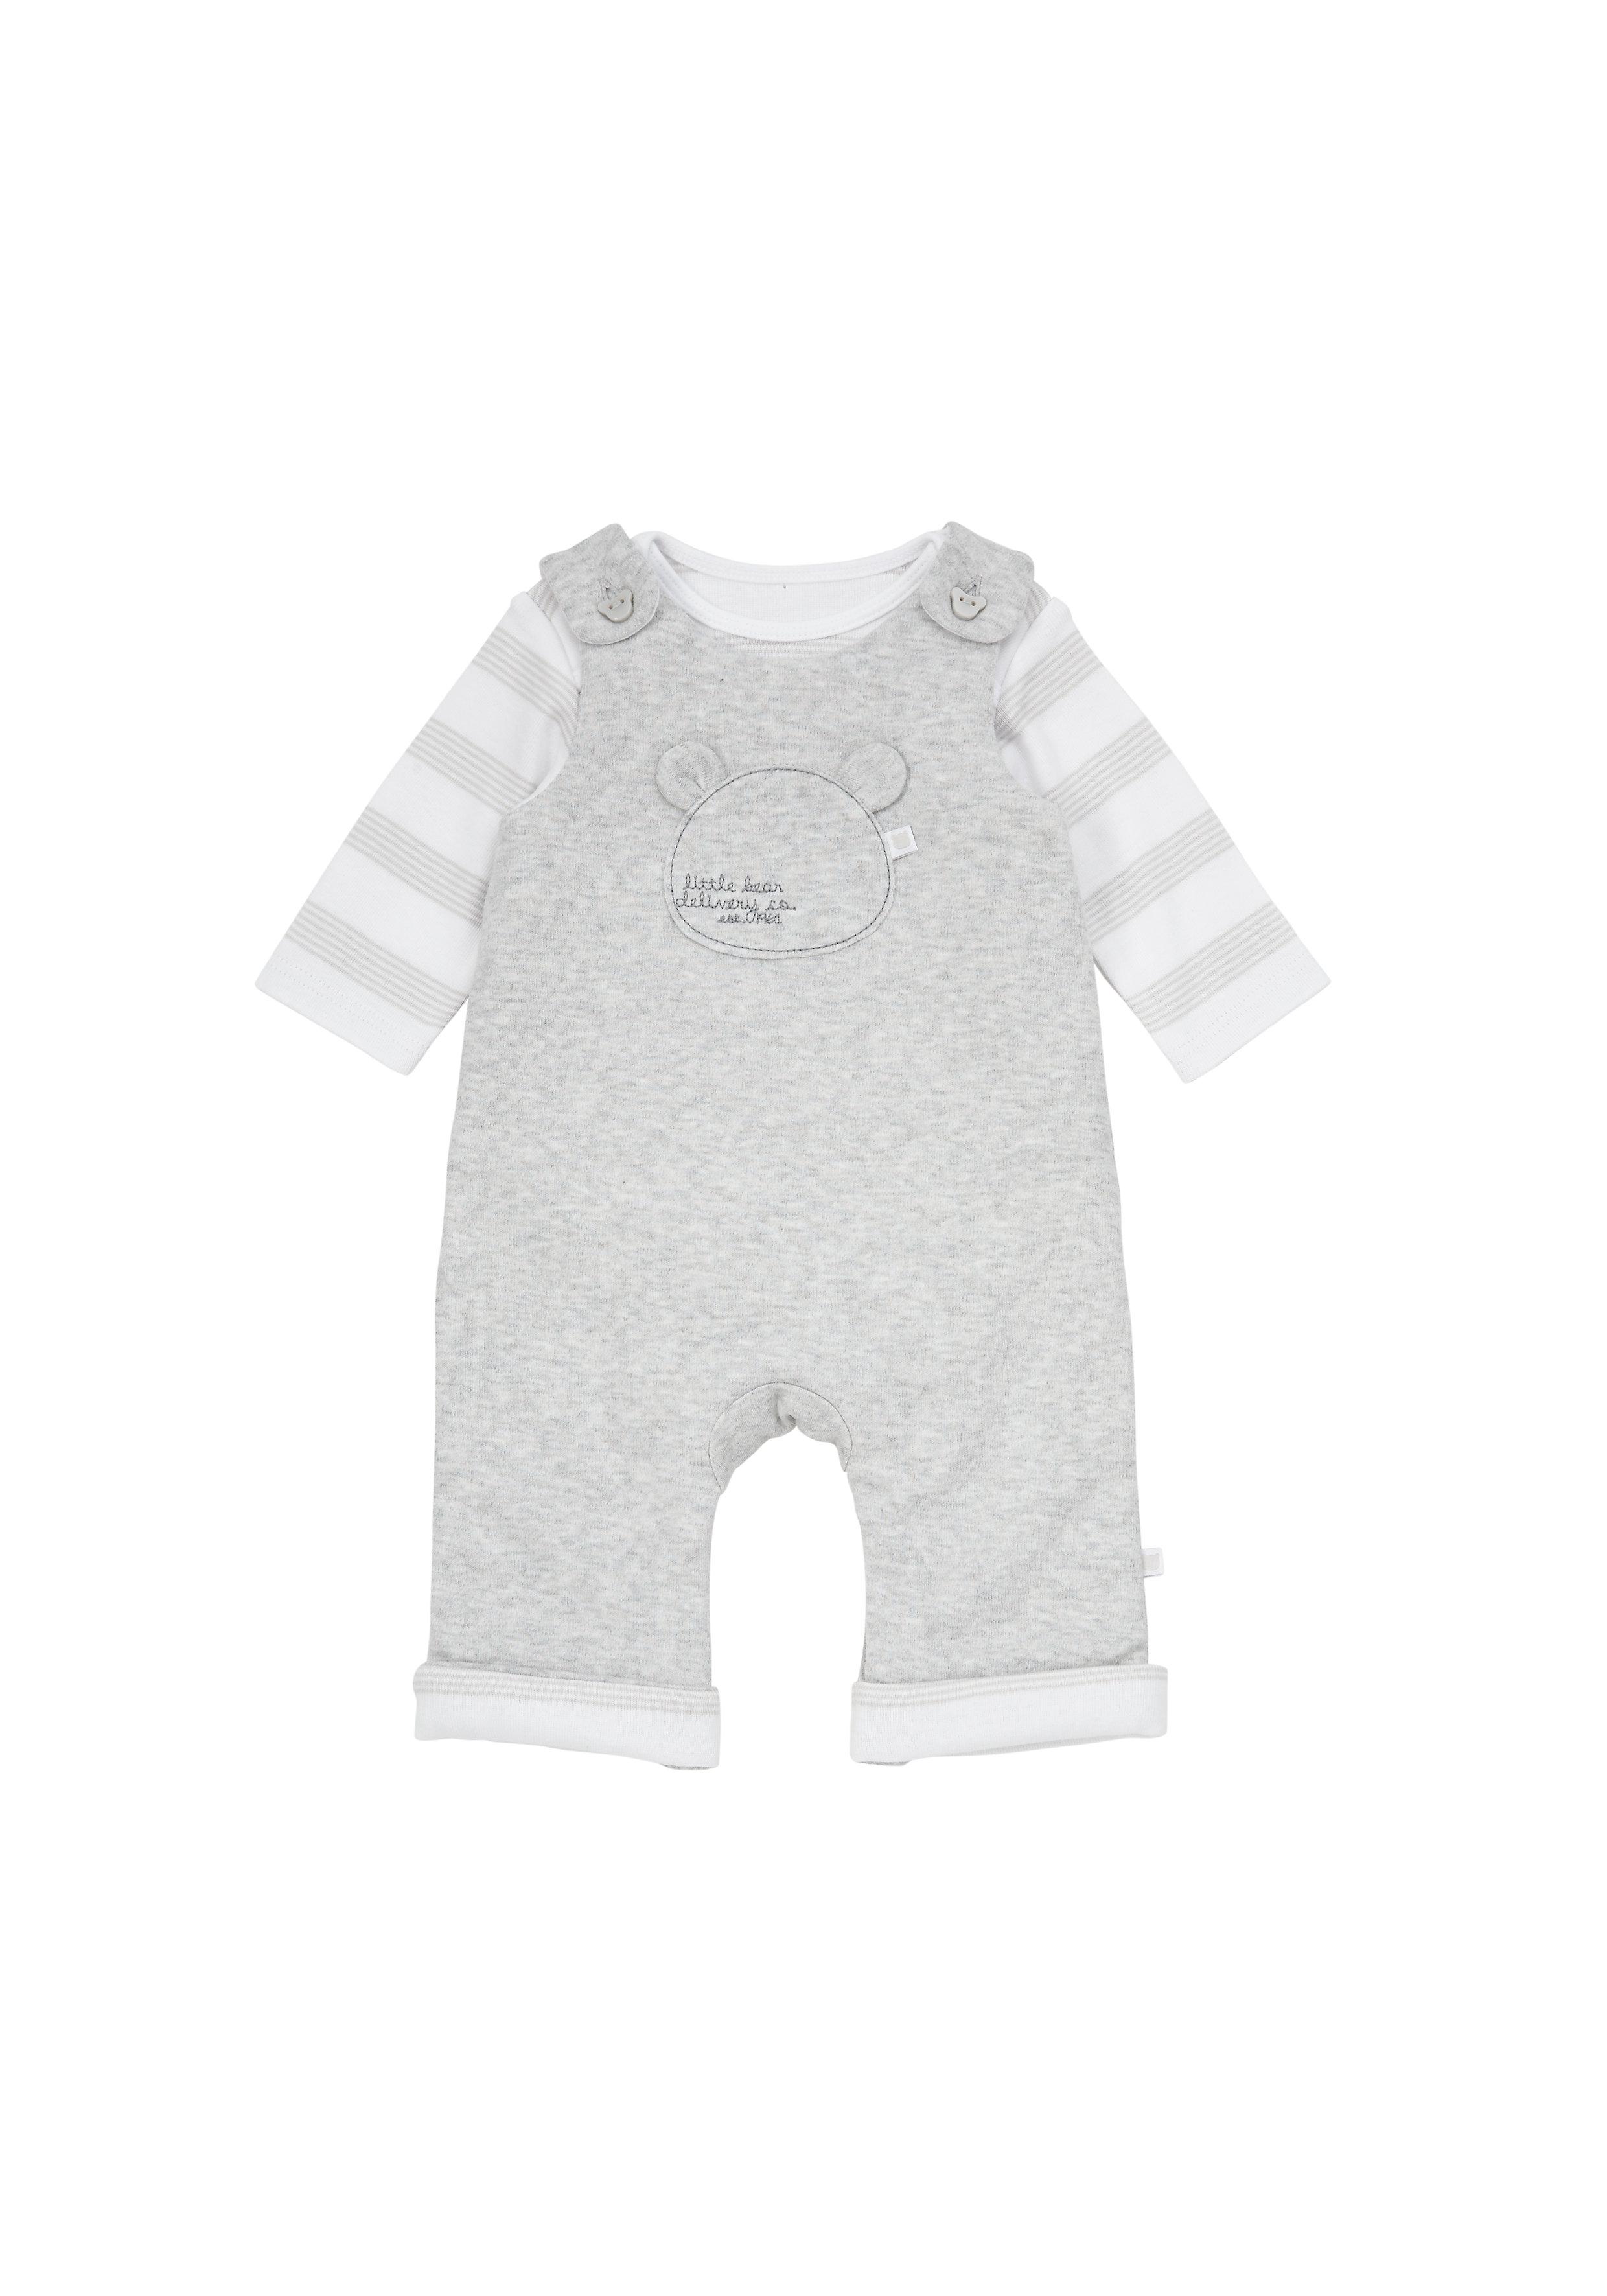 Mothercare | Unisex Dungaree Set - Grey